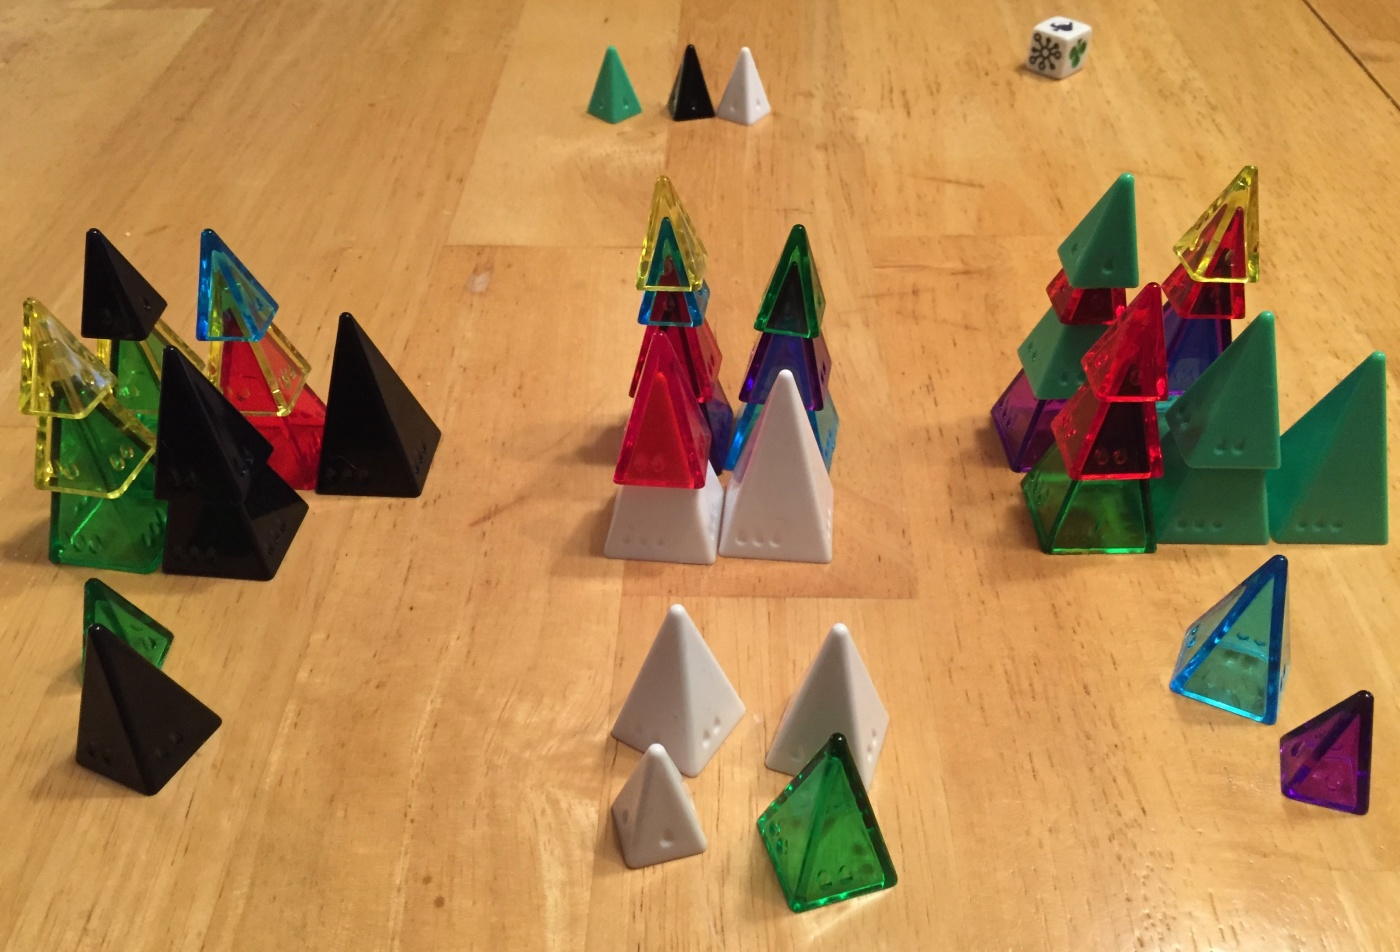 Steve Jackson Munchkin Munchkin Toys & Hobbies Go Down A Level Zip Mint Demand Exceeding Supply Games